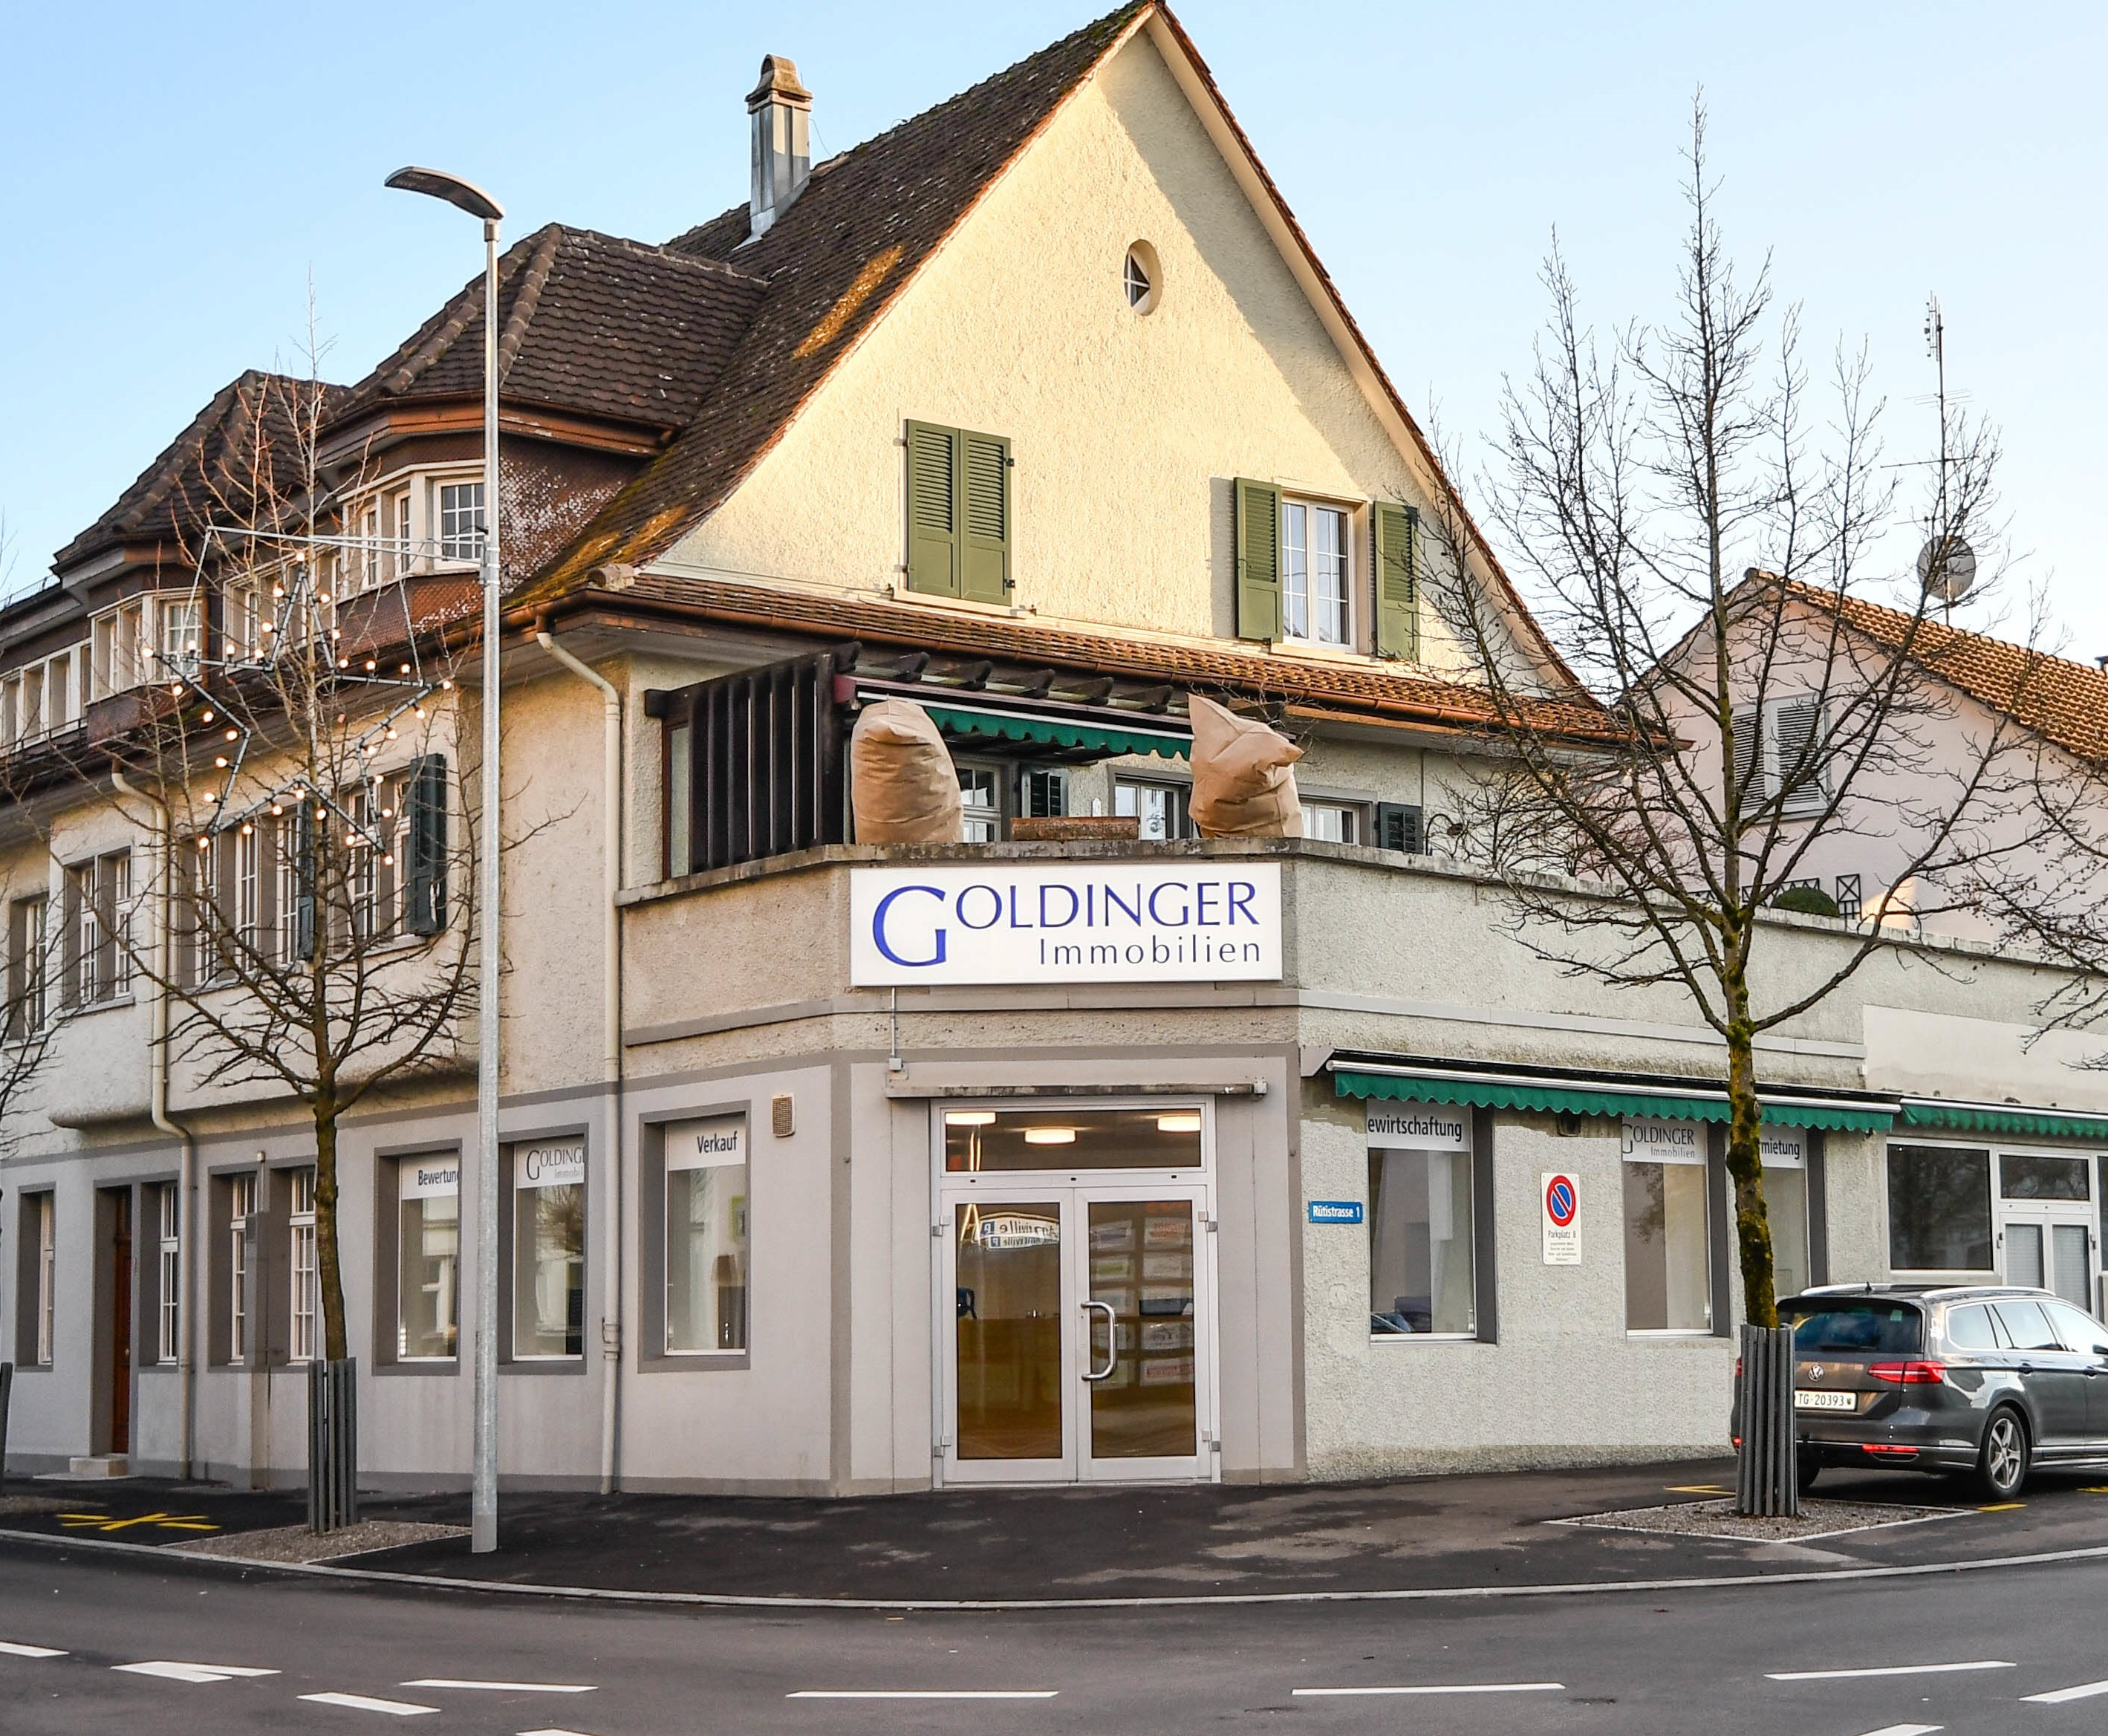 Immobilienexperten-Goldinger-Amriswil